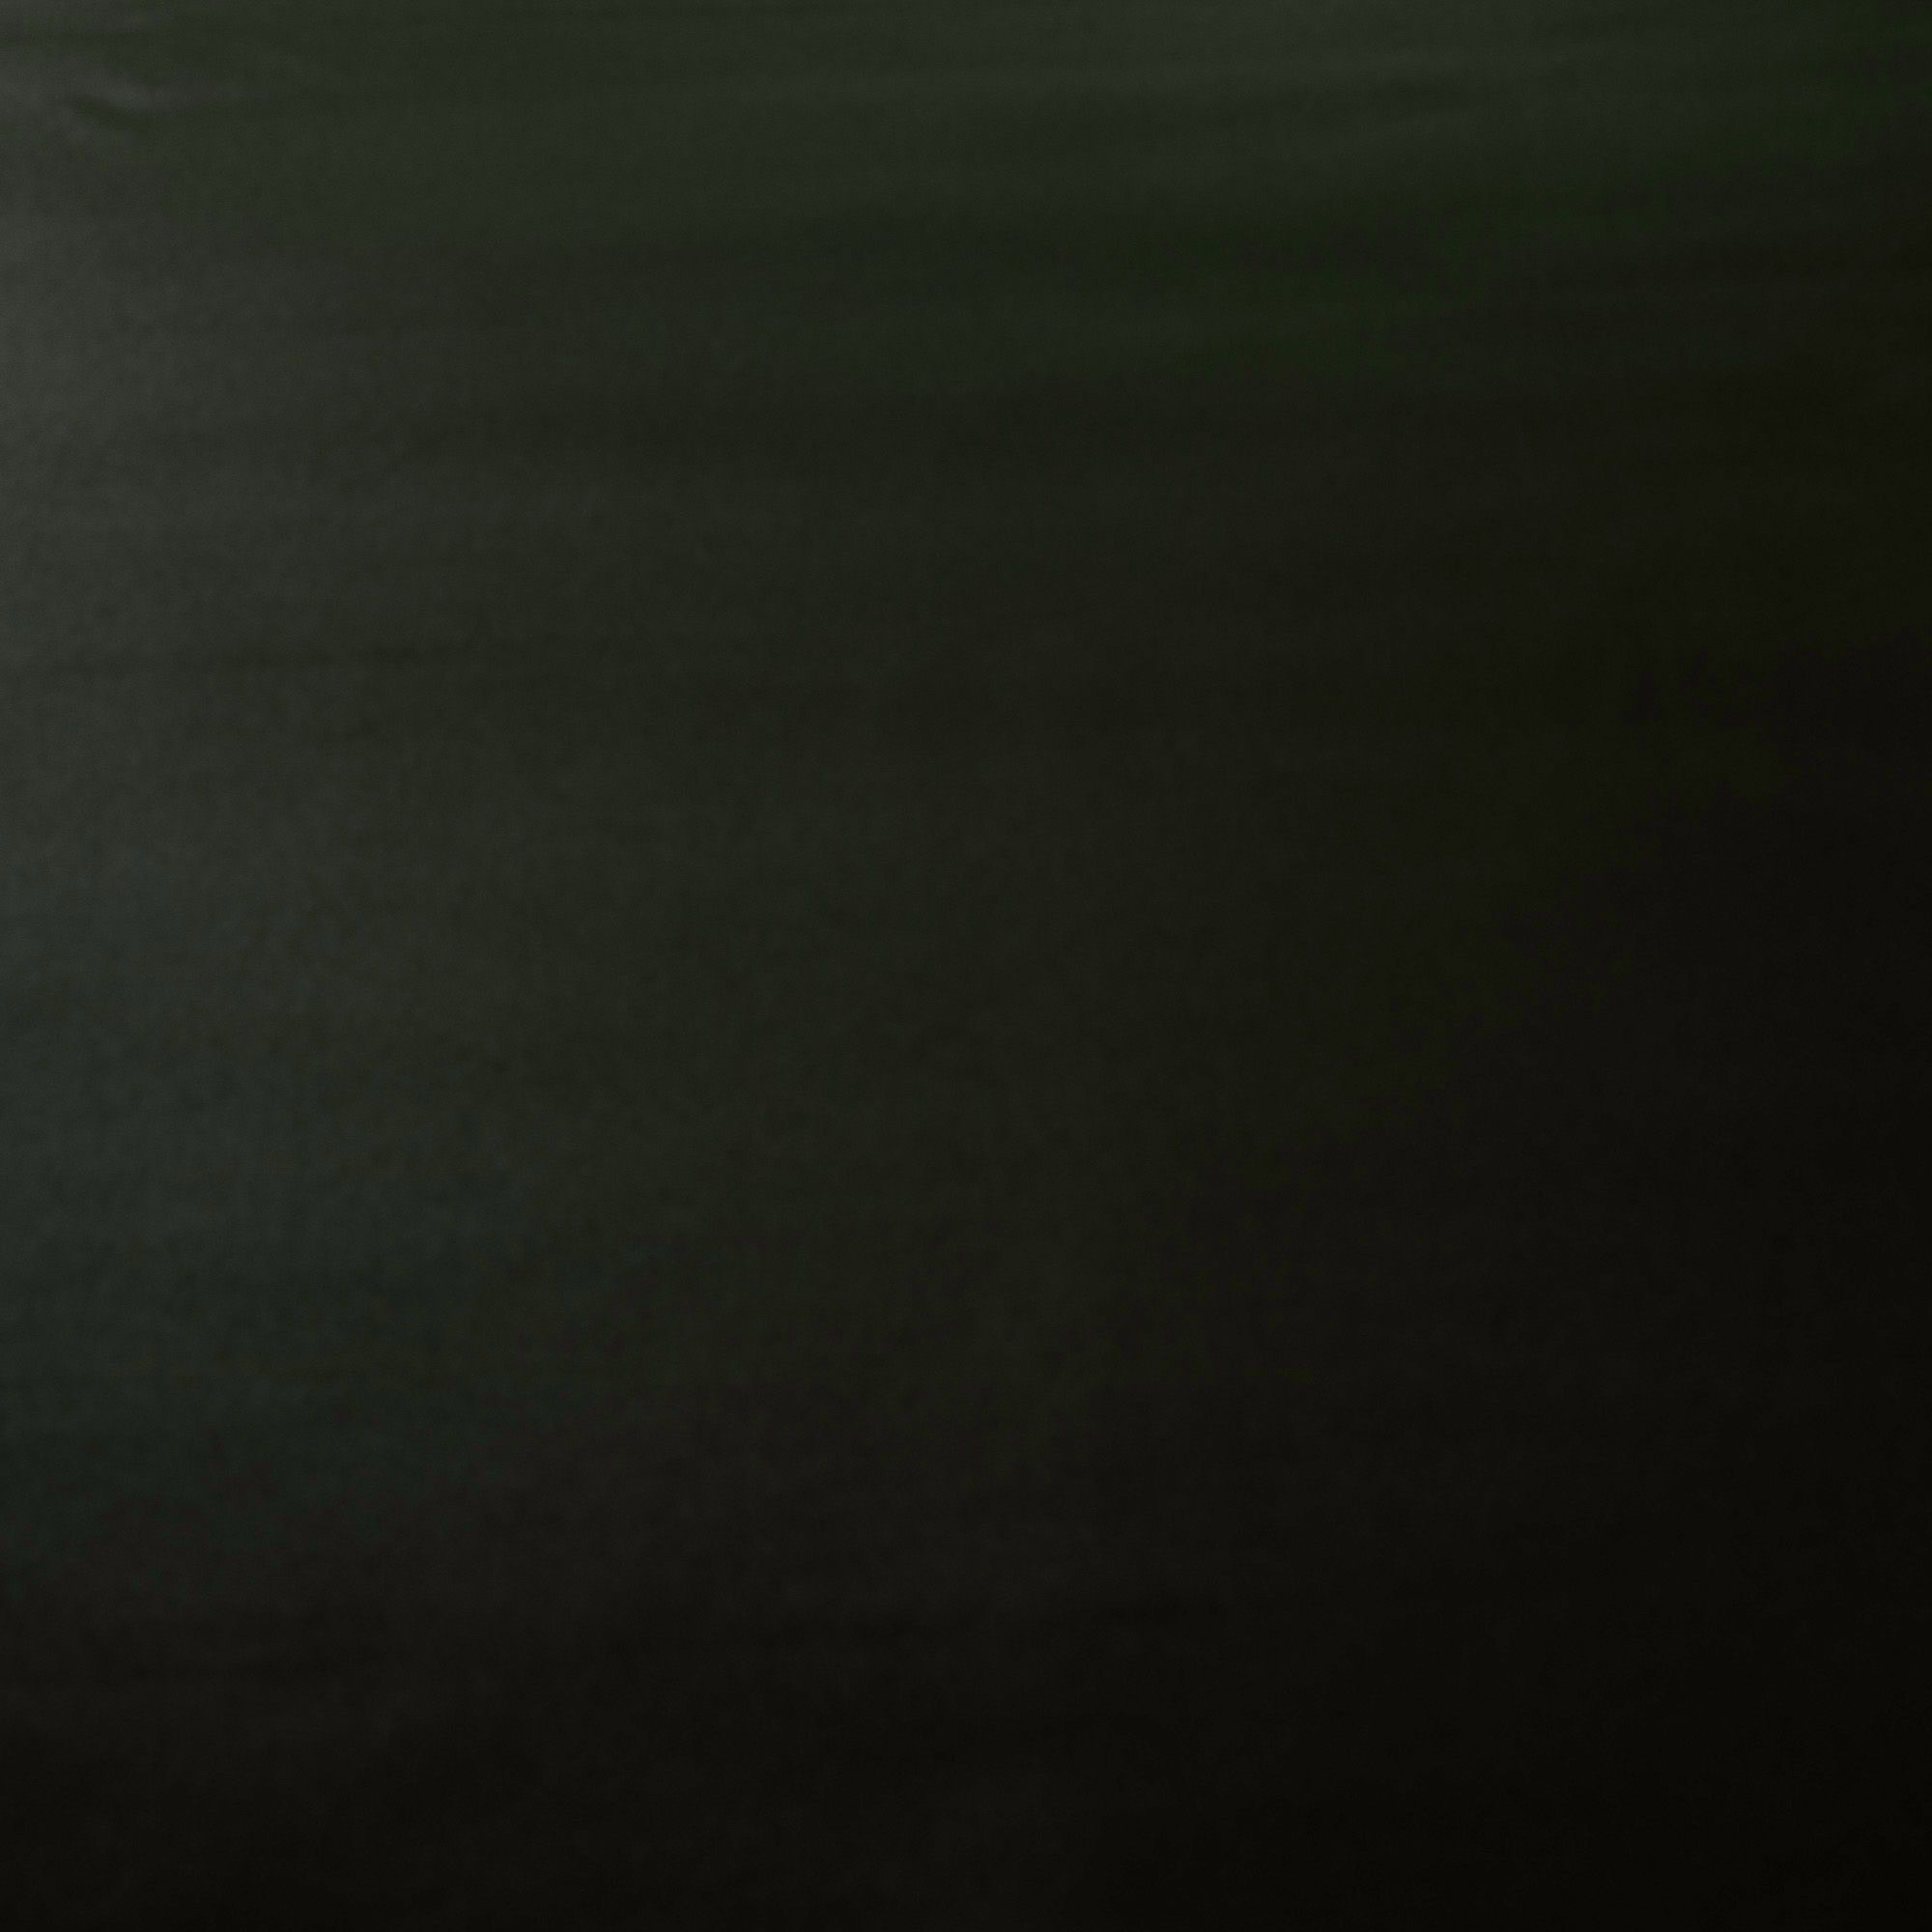 Tecido Cetim de Seda Charmeuse 1,50 Mt Largura Verde Musgo